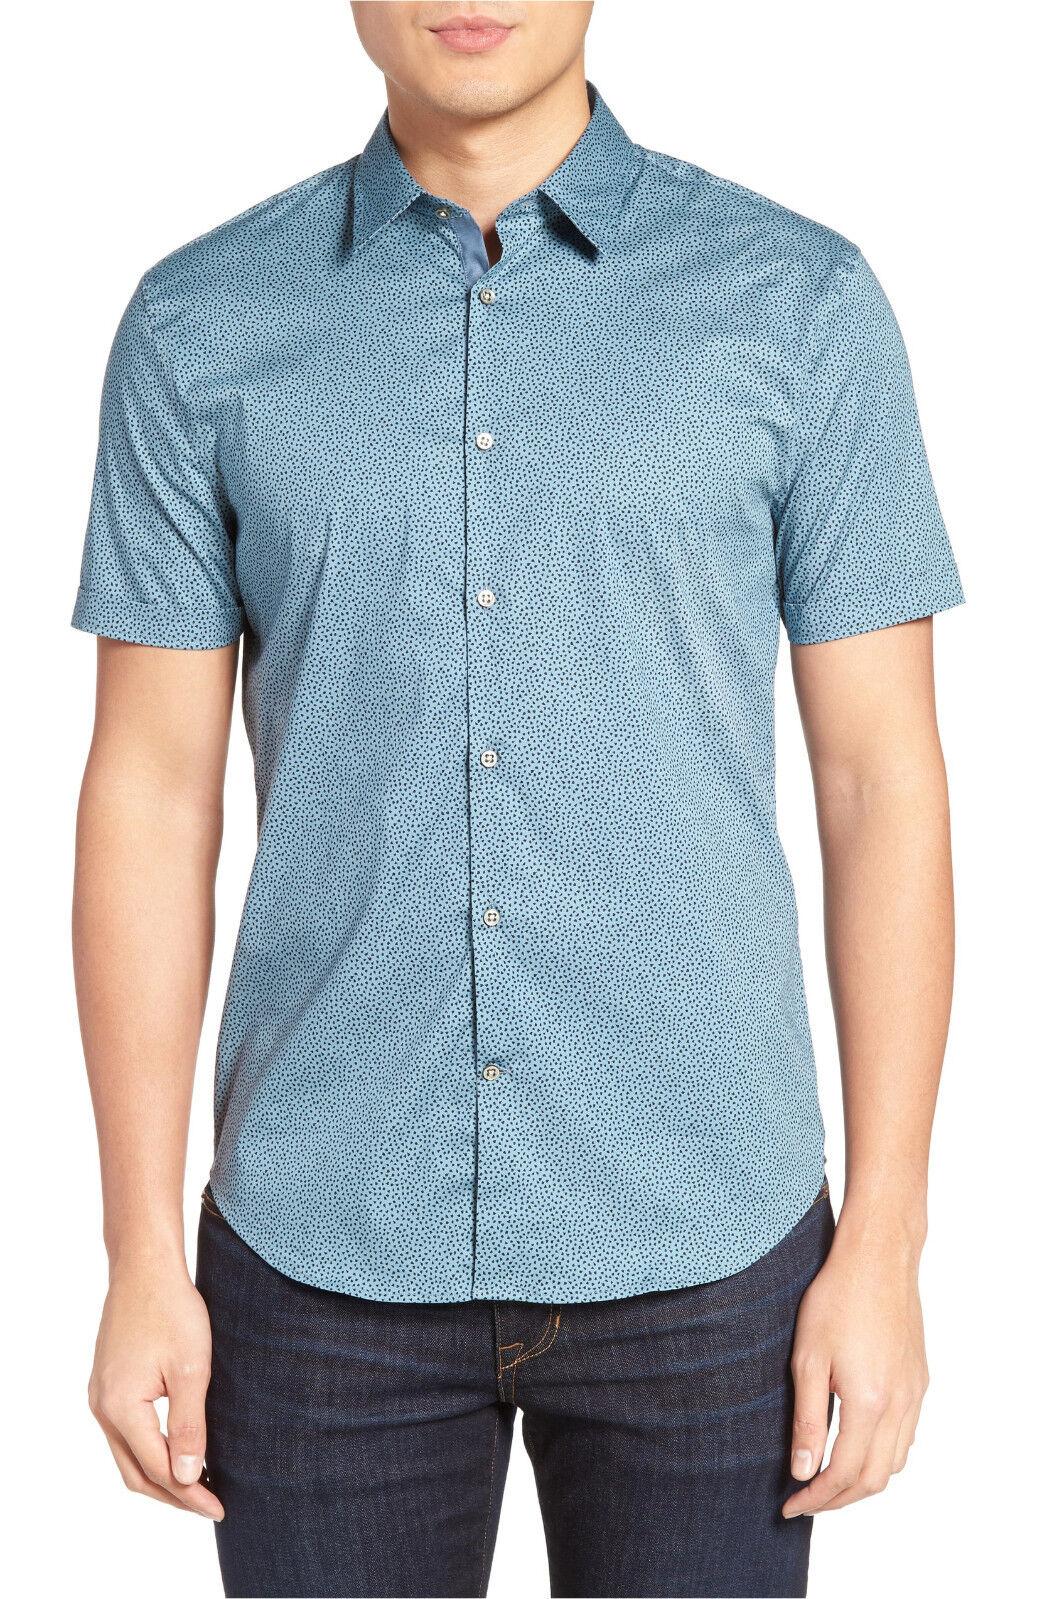 John Varvatos Star Usa Slim Fit Micro Print Short Sleeve Sport Shirt, M,